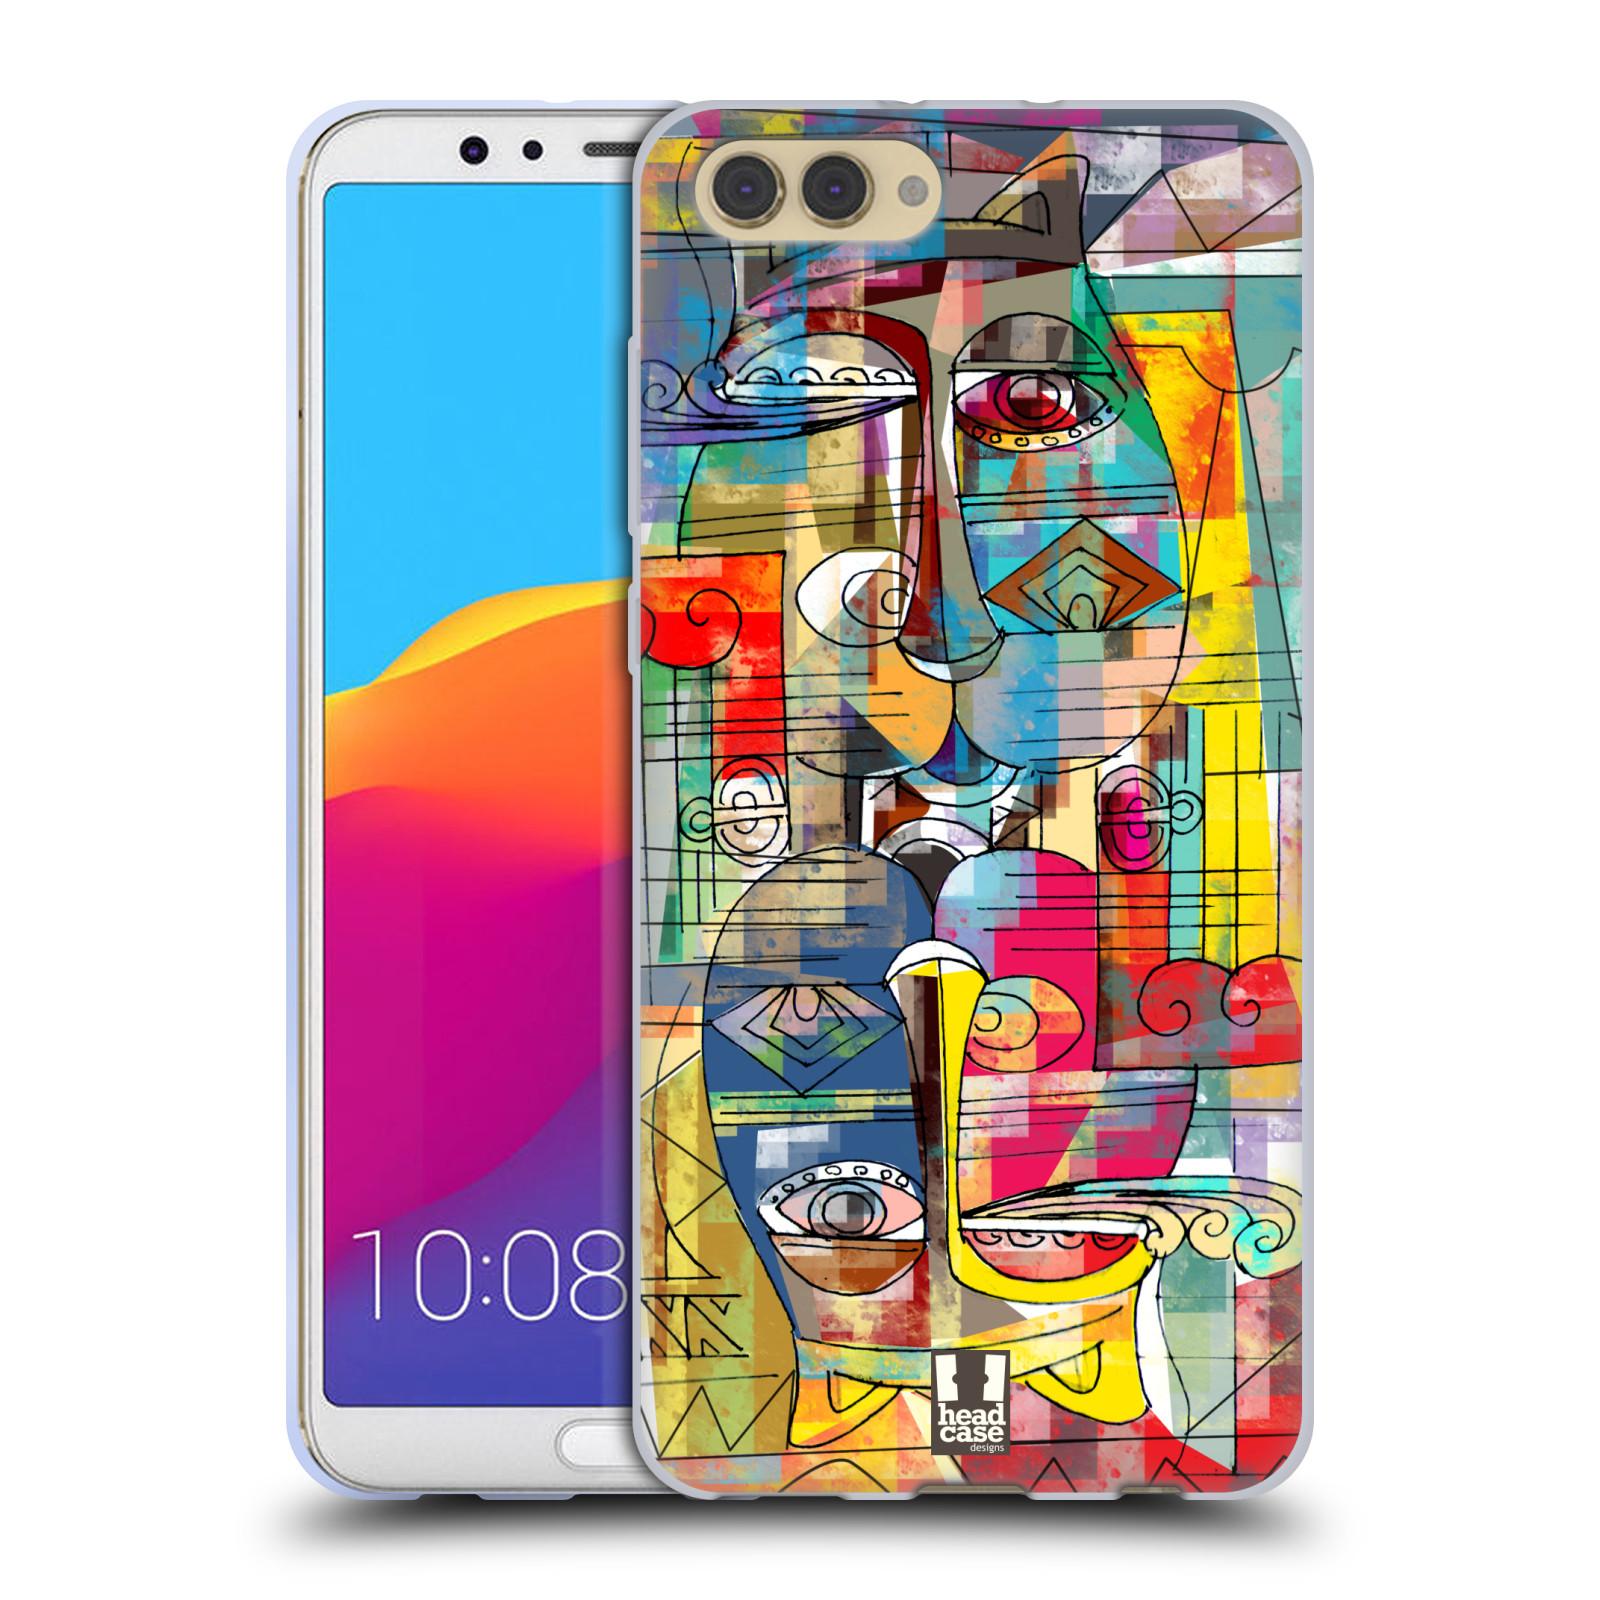 Silikonové pouzdro na mobil Honor View 10 - Head Case - AZTEC MANX